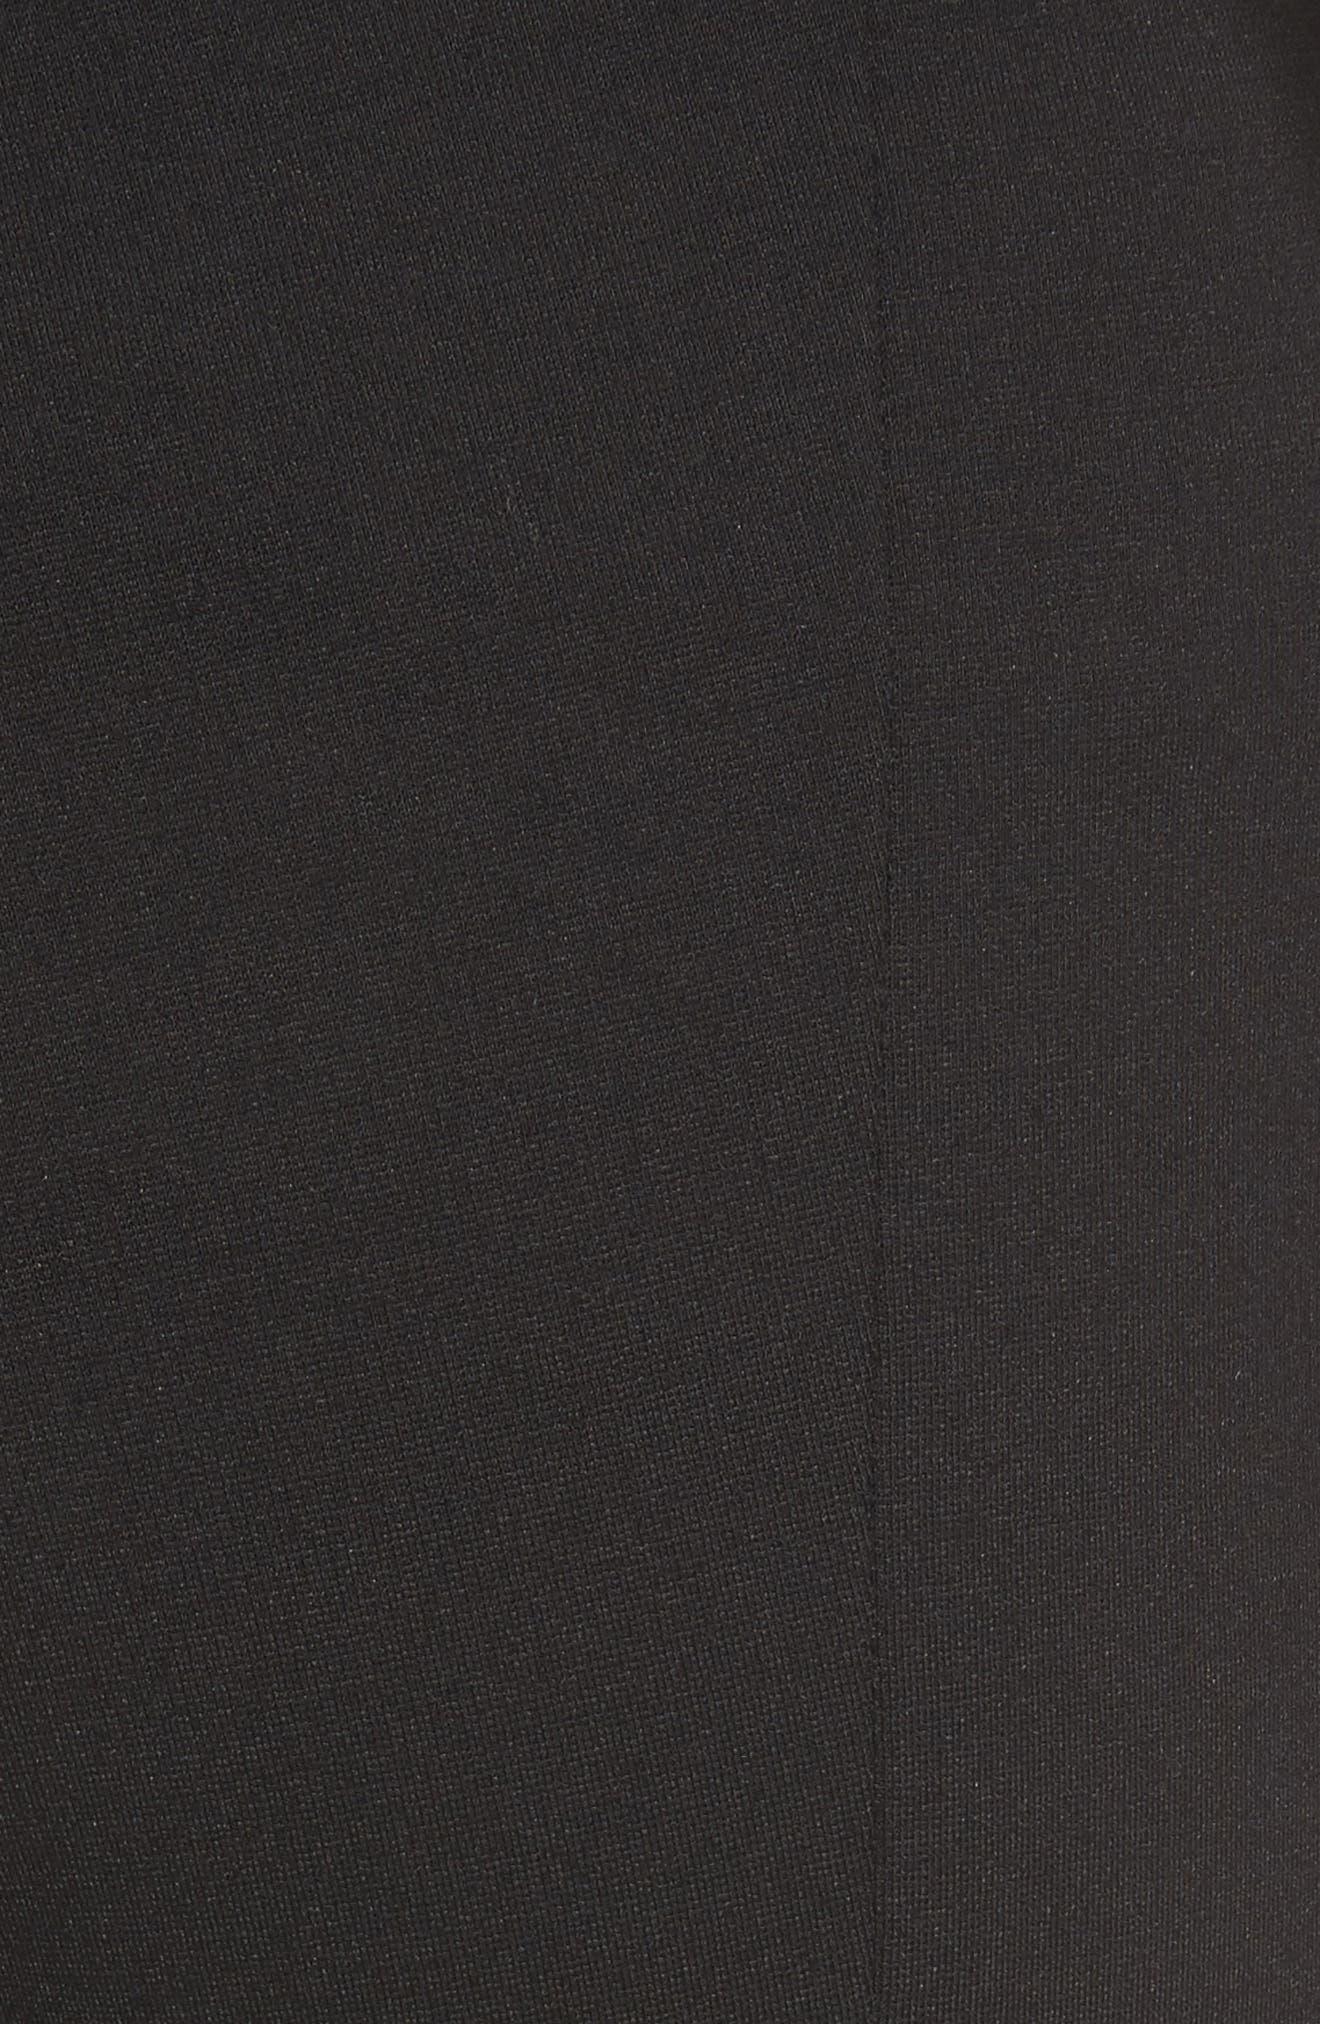 Crop Stretch Knit Trousers,                             Alternate thumbnail 5, color,                             Black